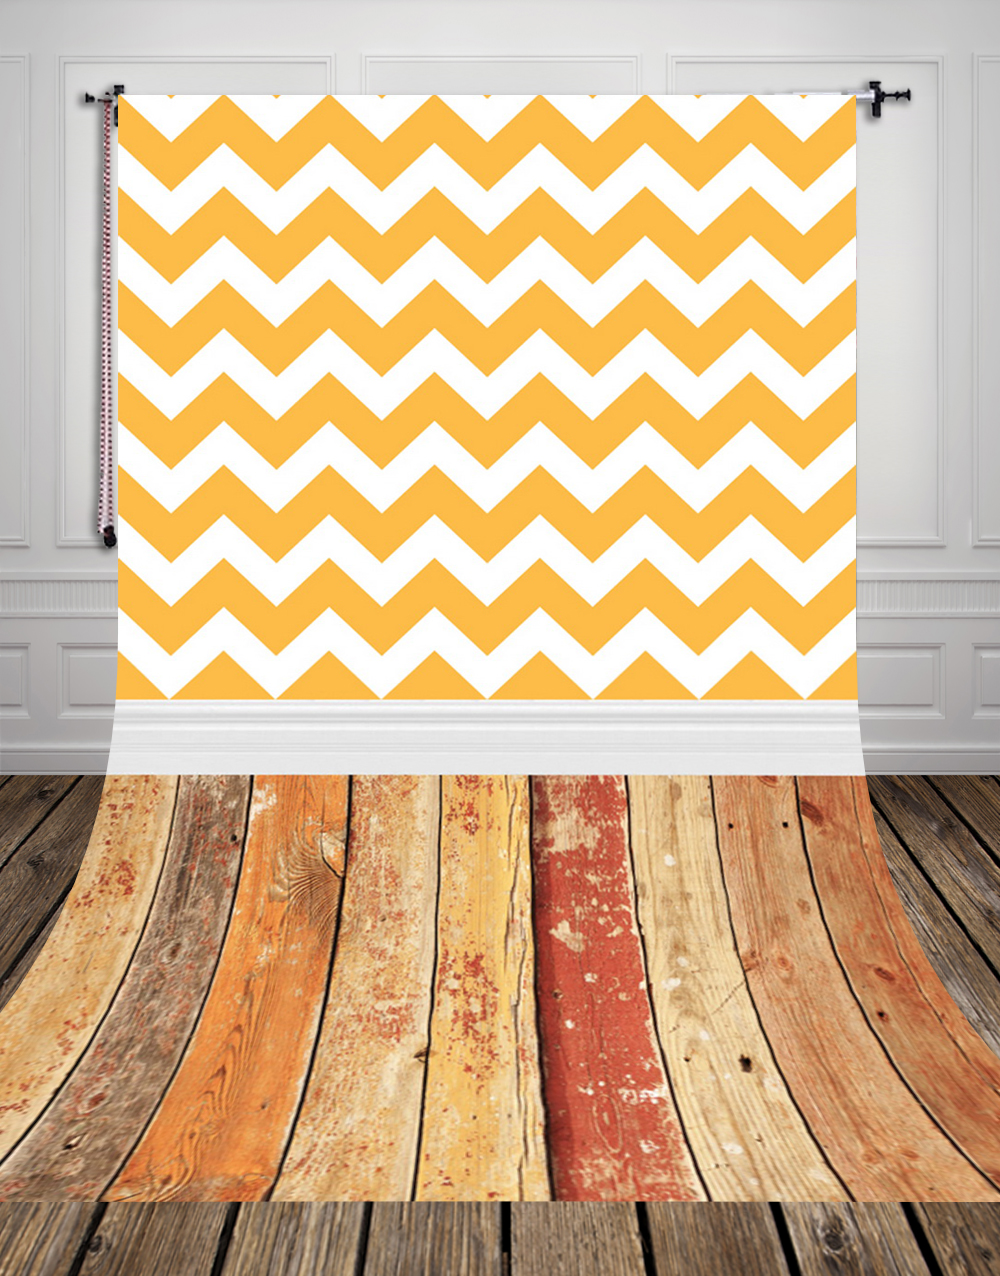 HUAYI Vintage Wood Floor Backdrop Vintage Yellow Chevron Wall Art ...